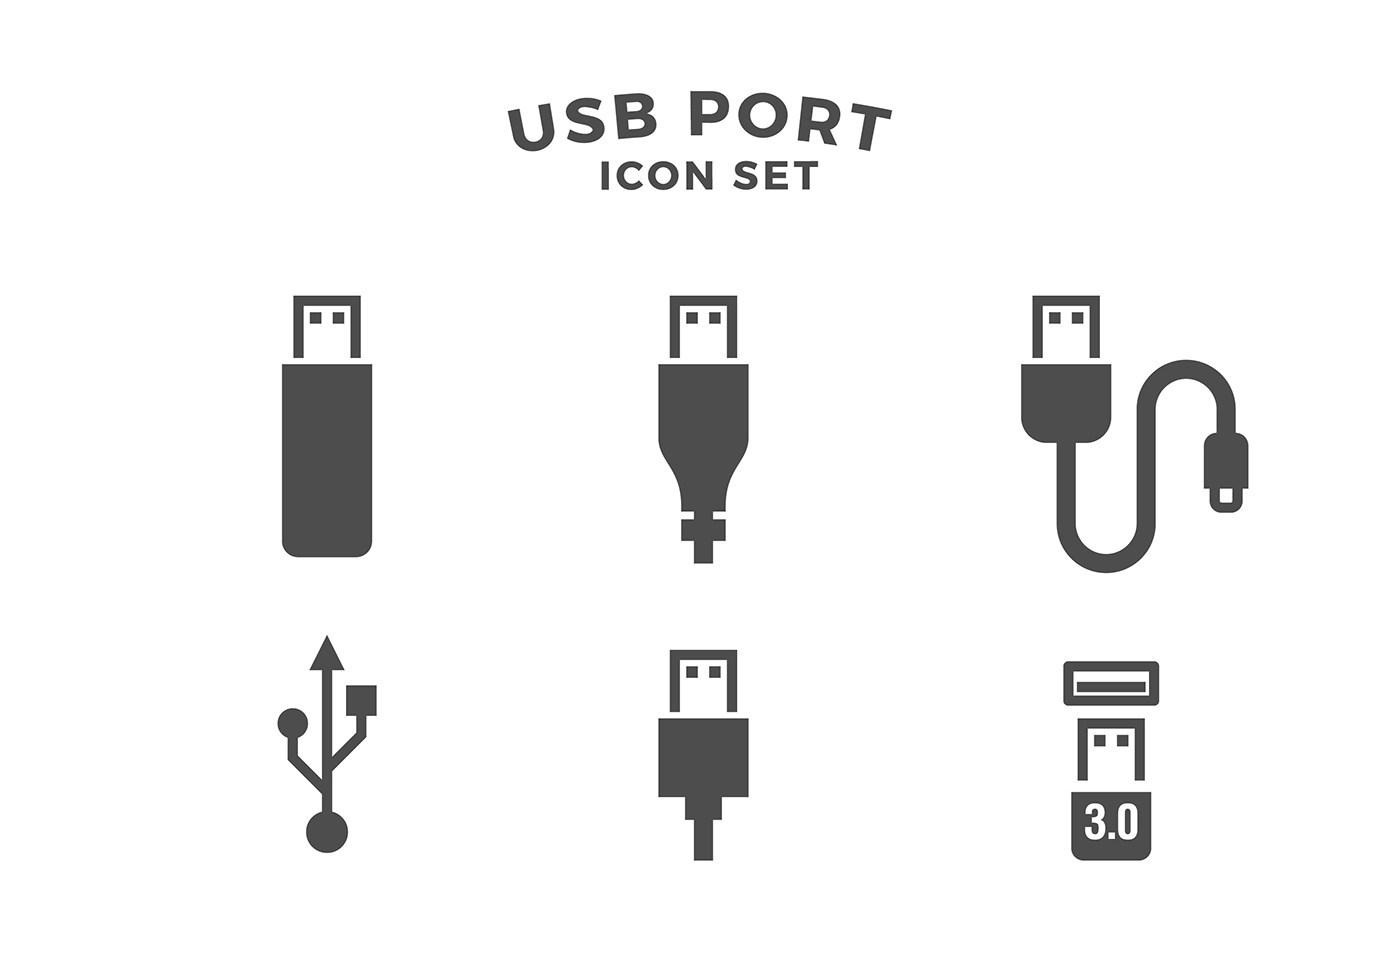 Usb Port Icon Set Free Vector